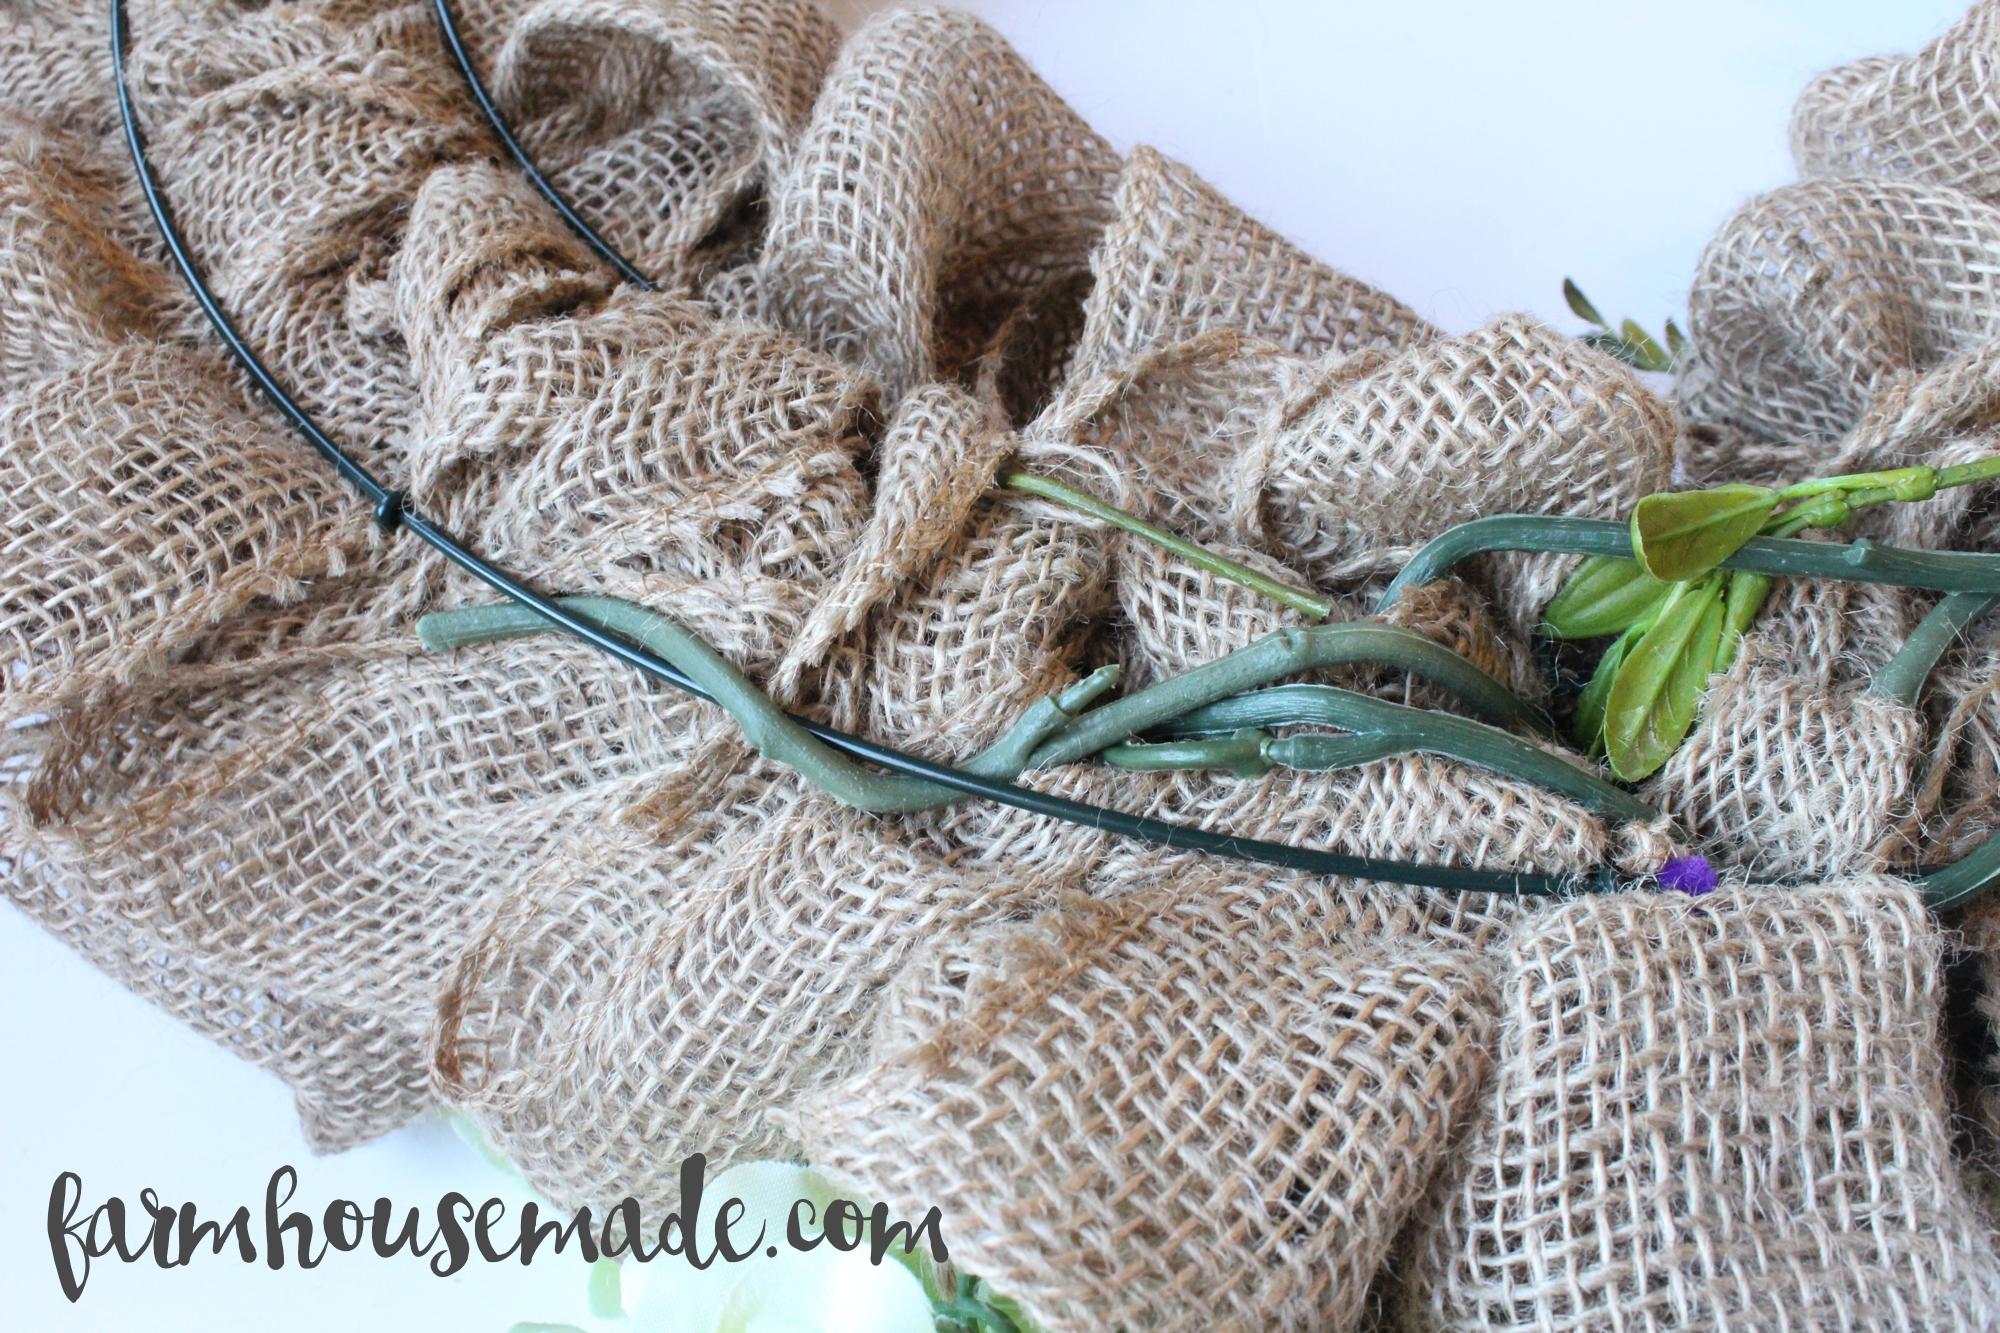 How To Make A Burlap Wreath Farmhouse Made